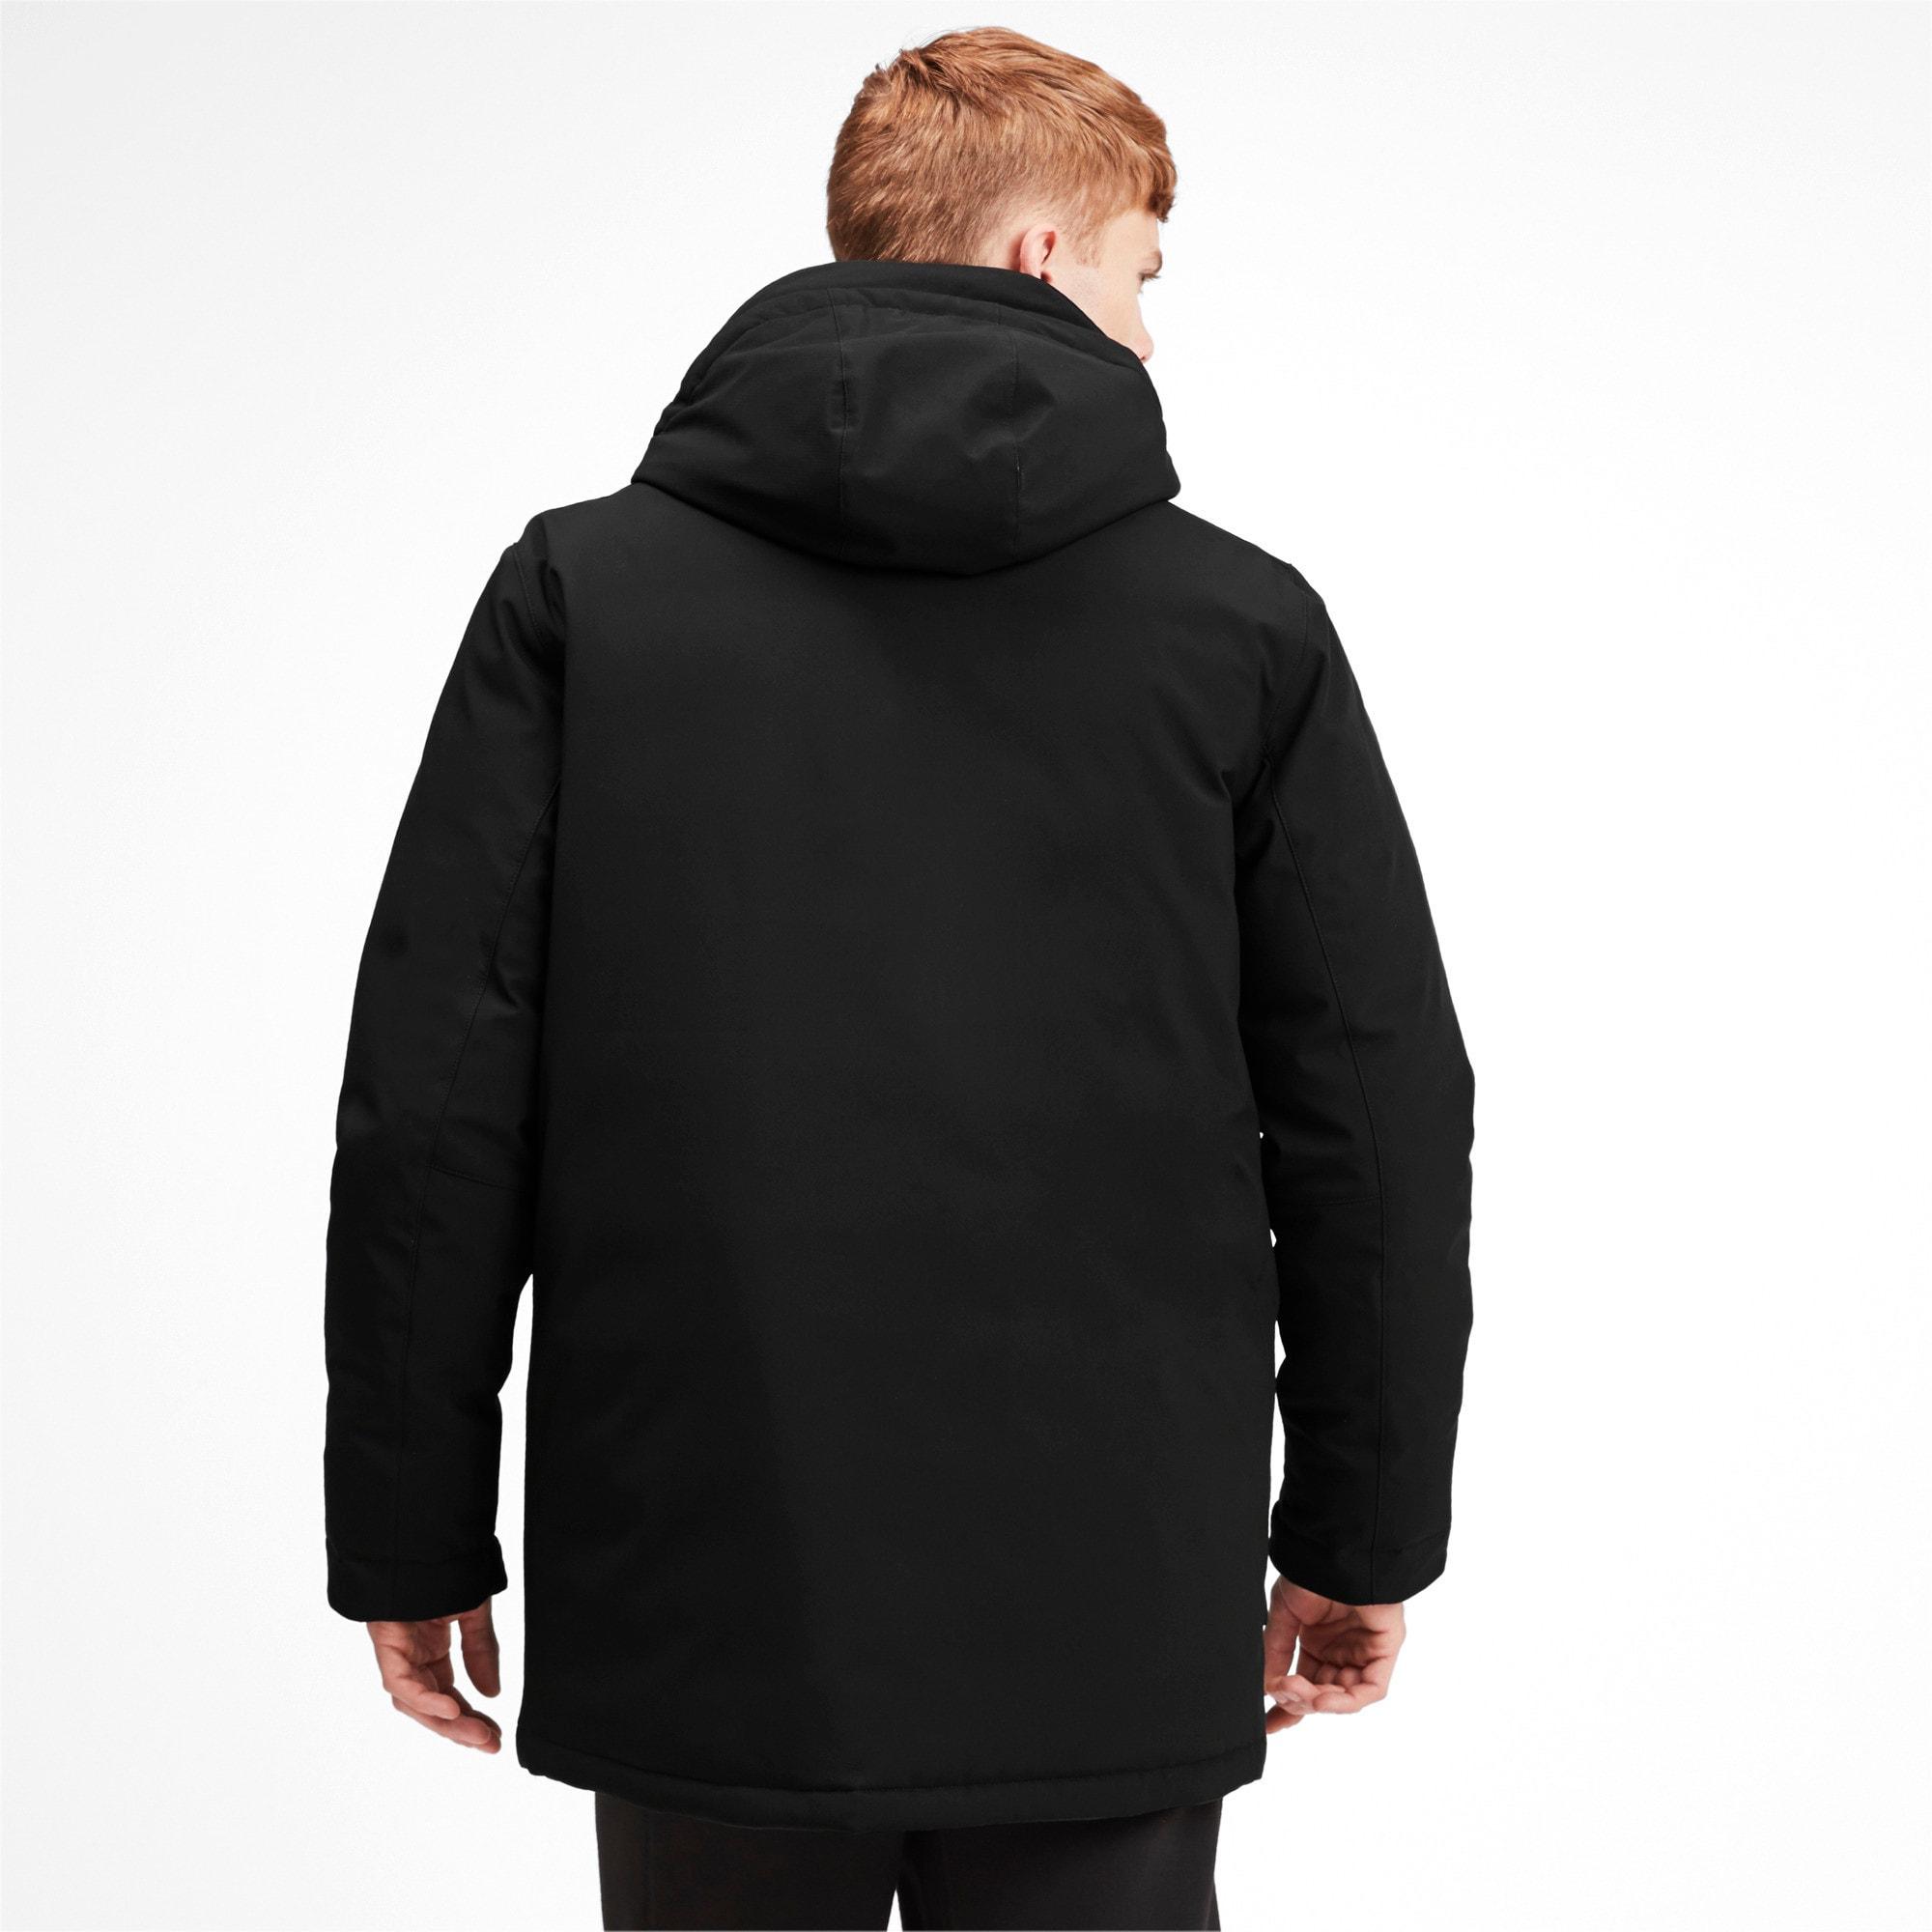 Thumbnail 3 of Epoch Storm Men's Down Jacket, Puma Black, medium